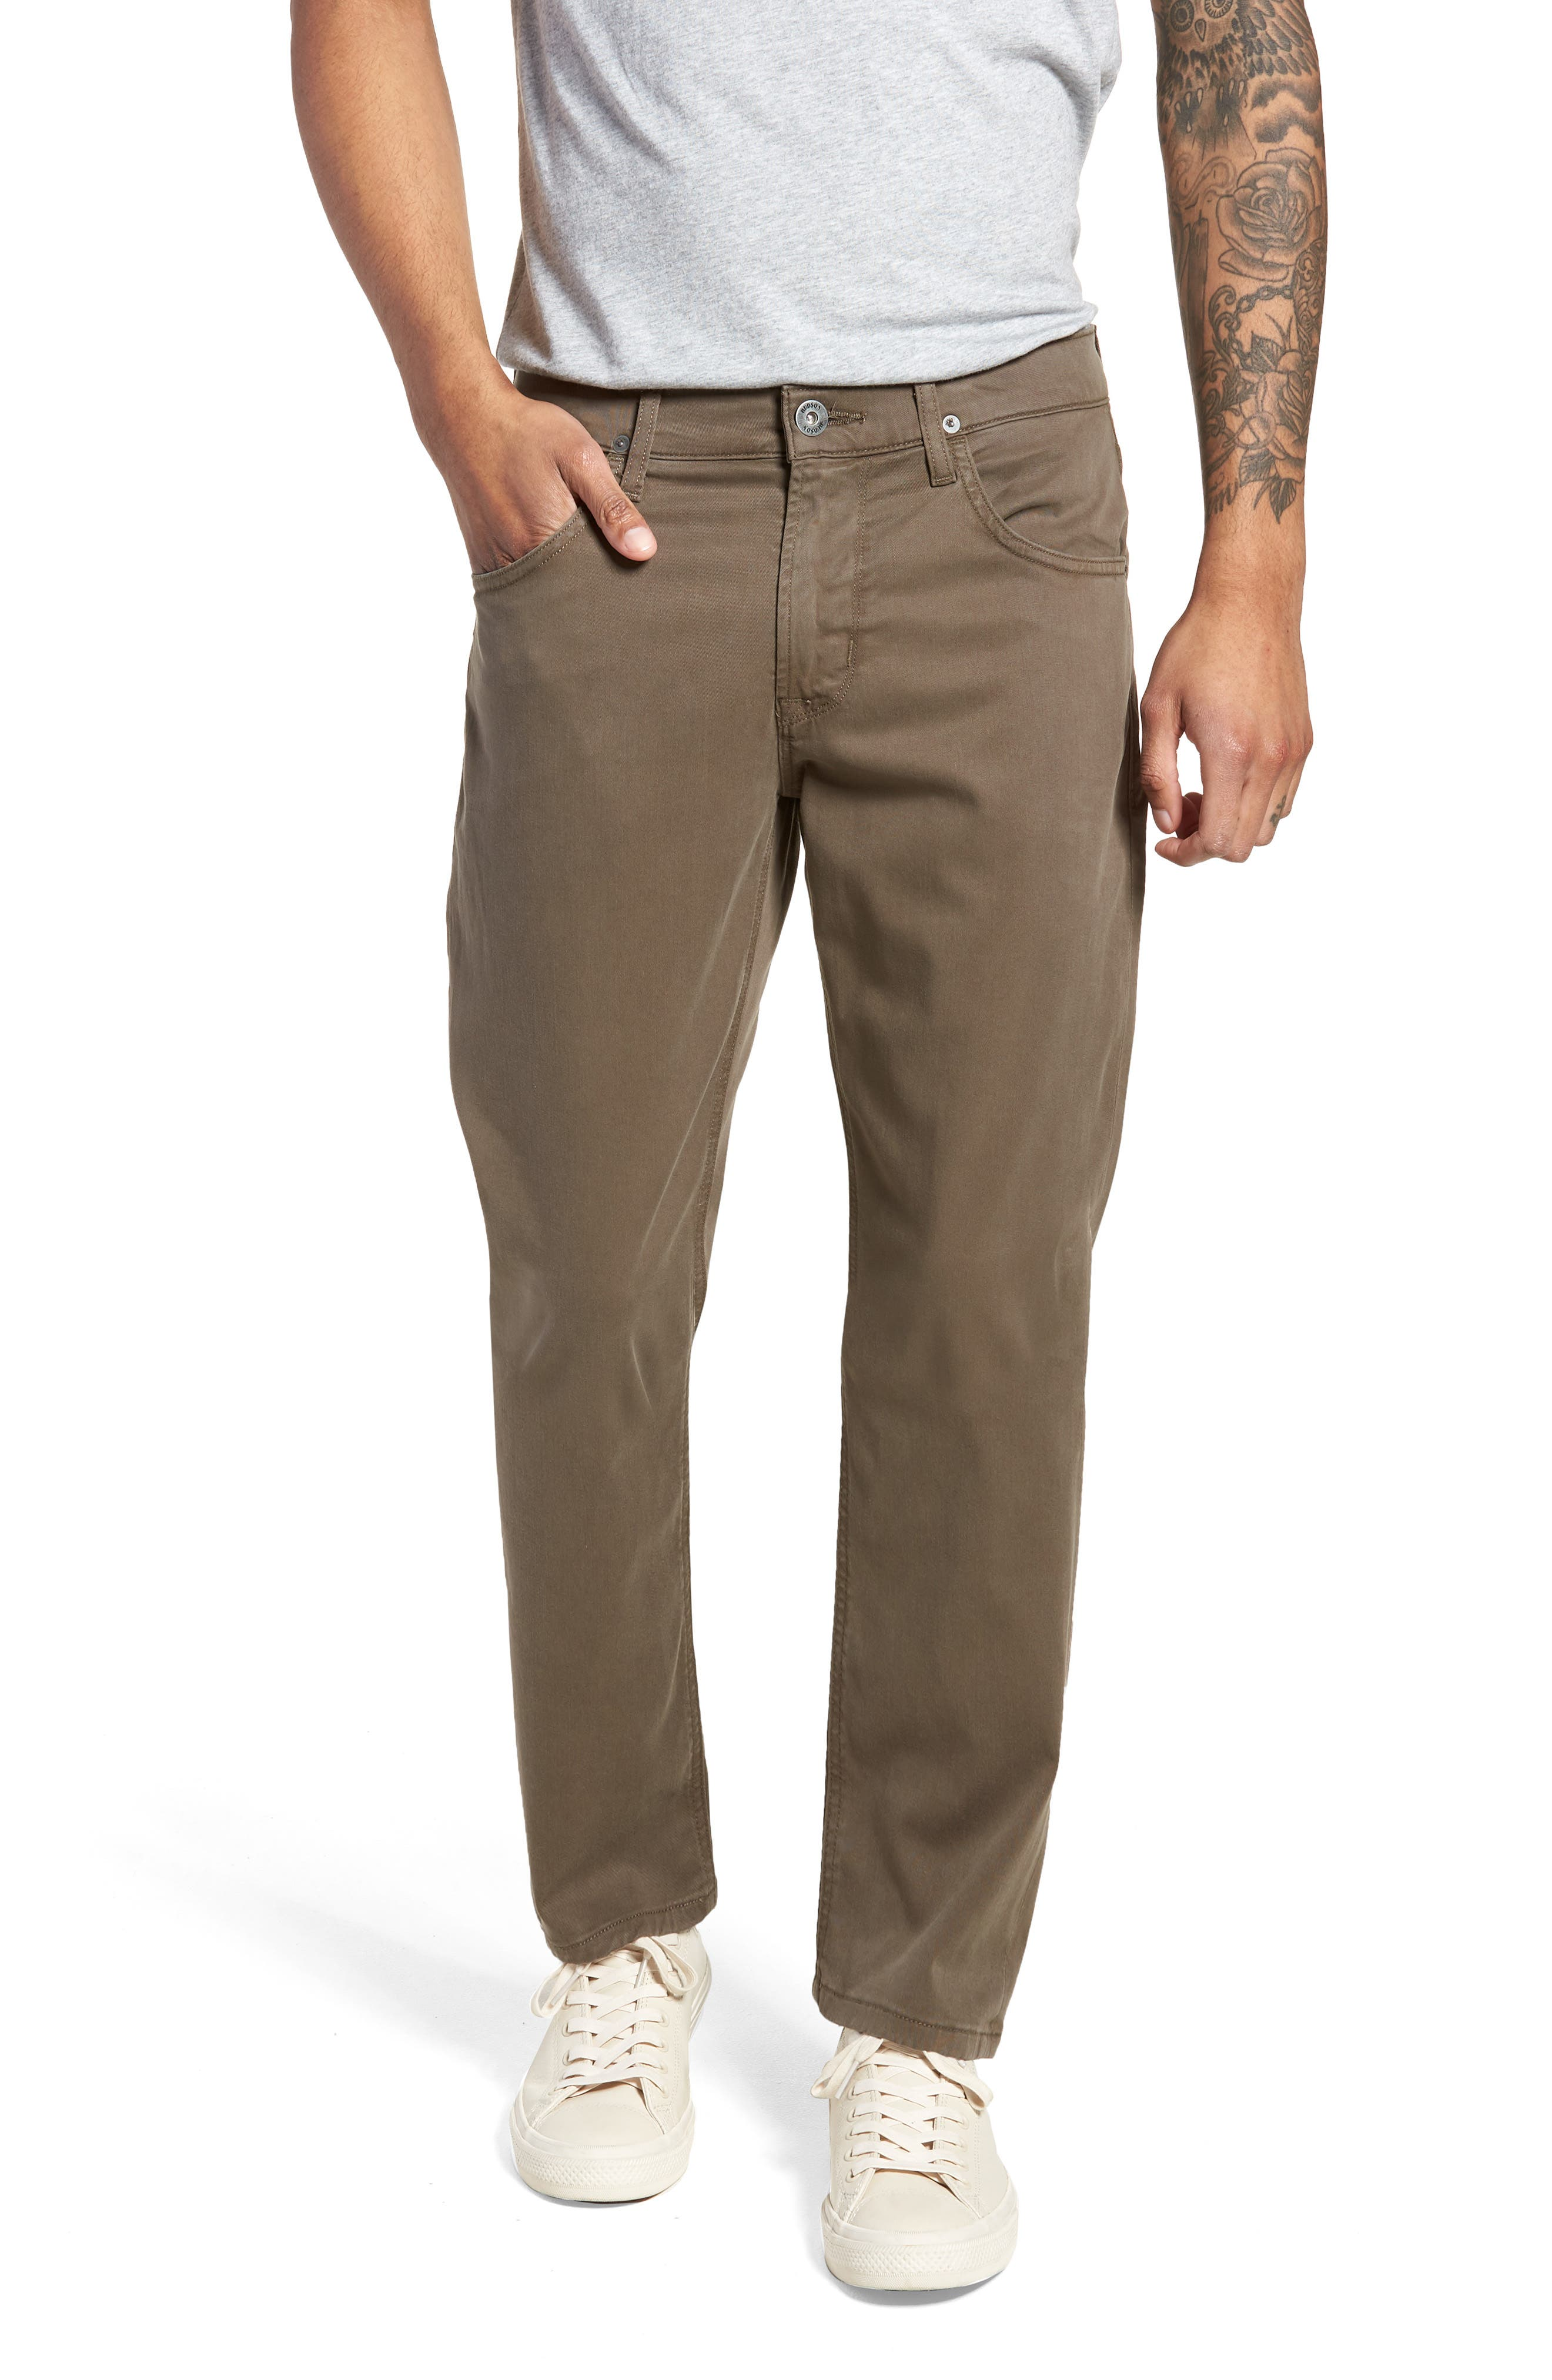 Blake Slim Fit Jeans,                             Main thumbnail 1, color,                             Plaster